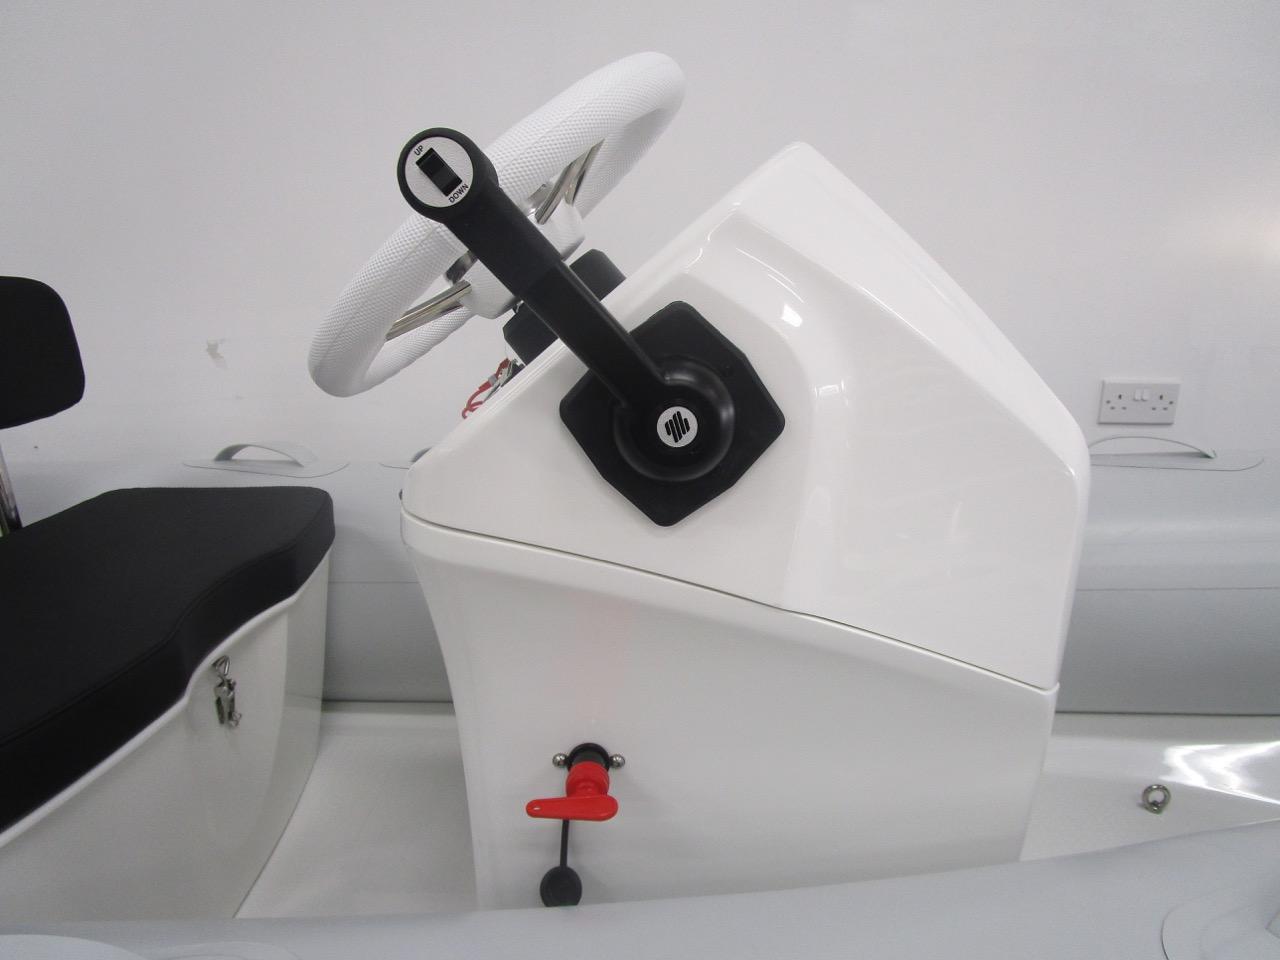 GRAND S300 RIB flush mount throttle control